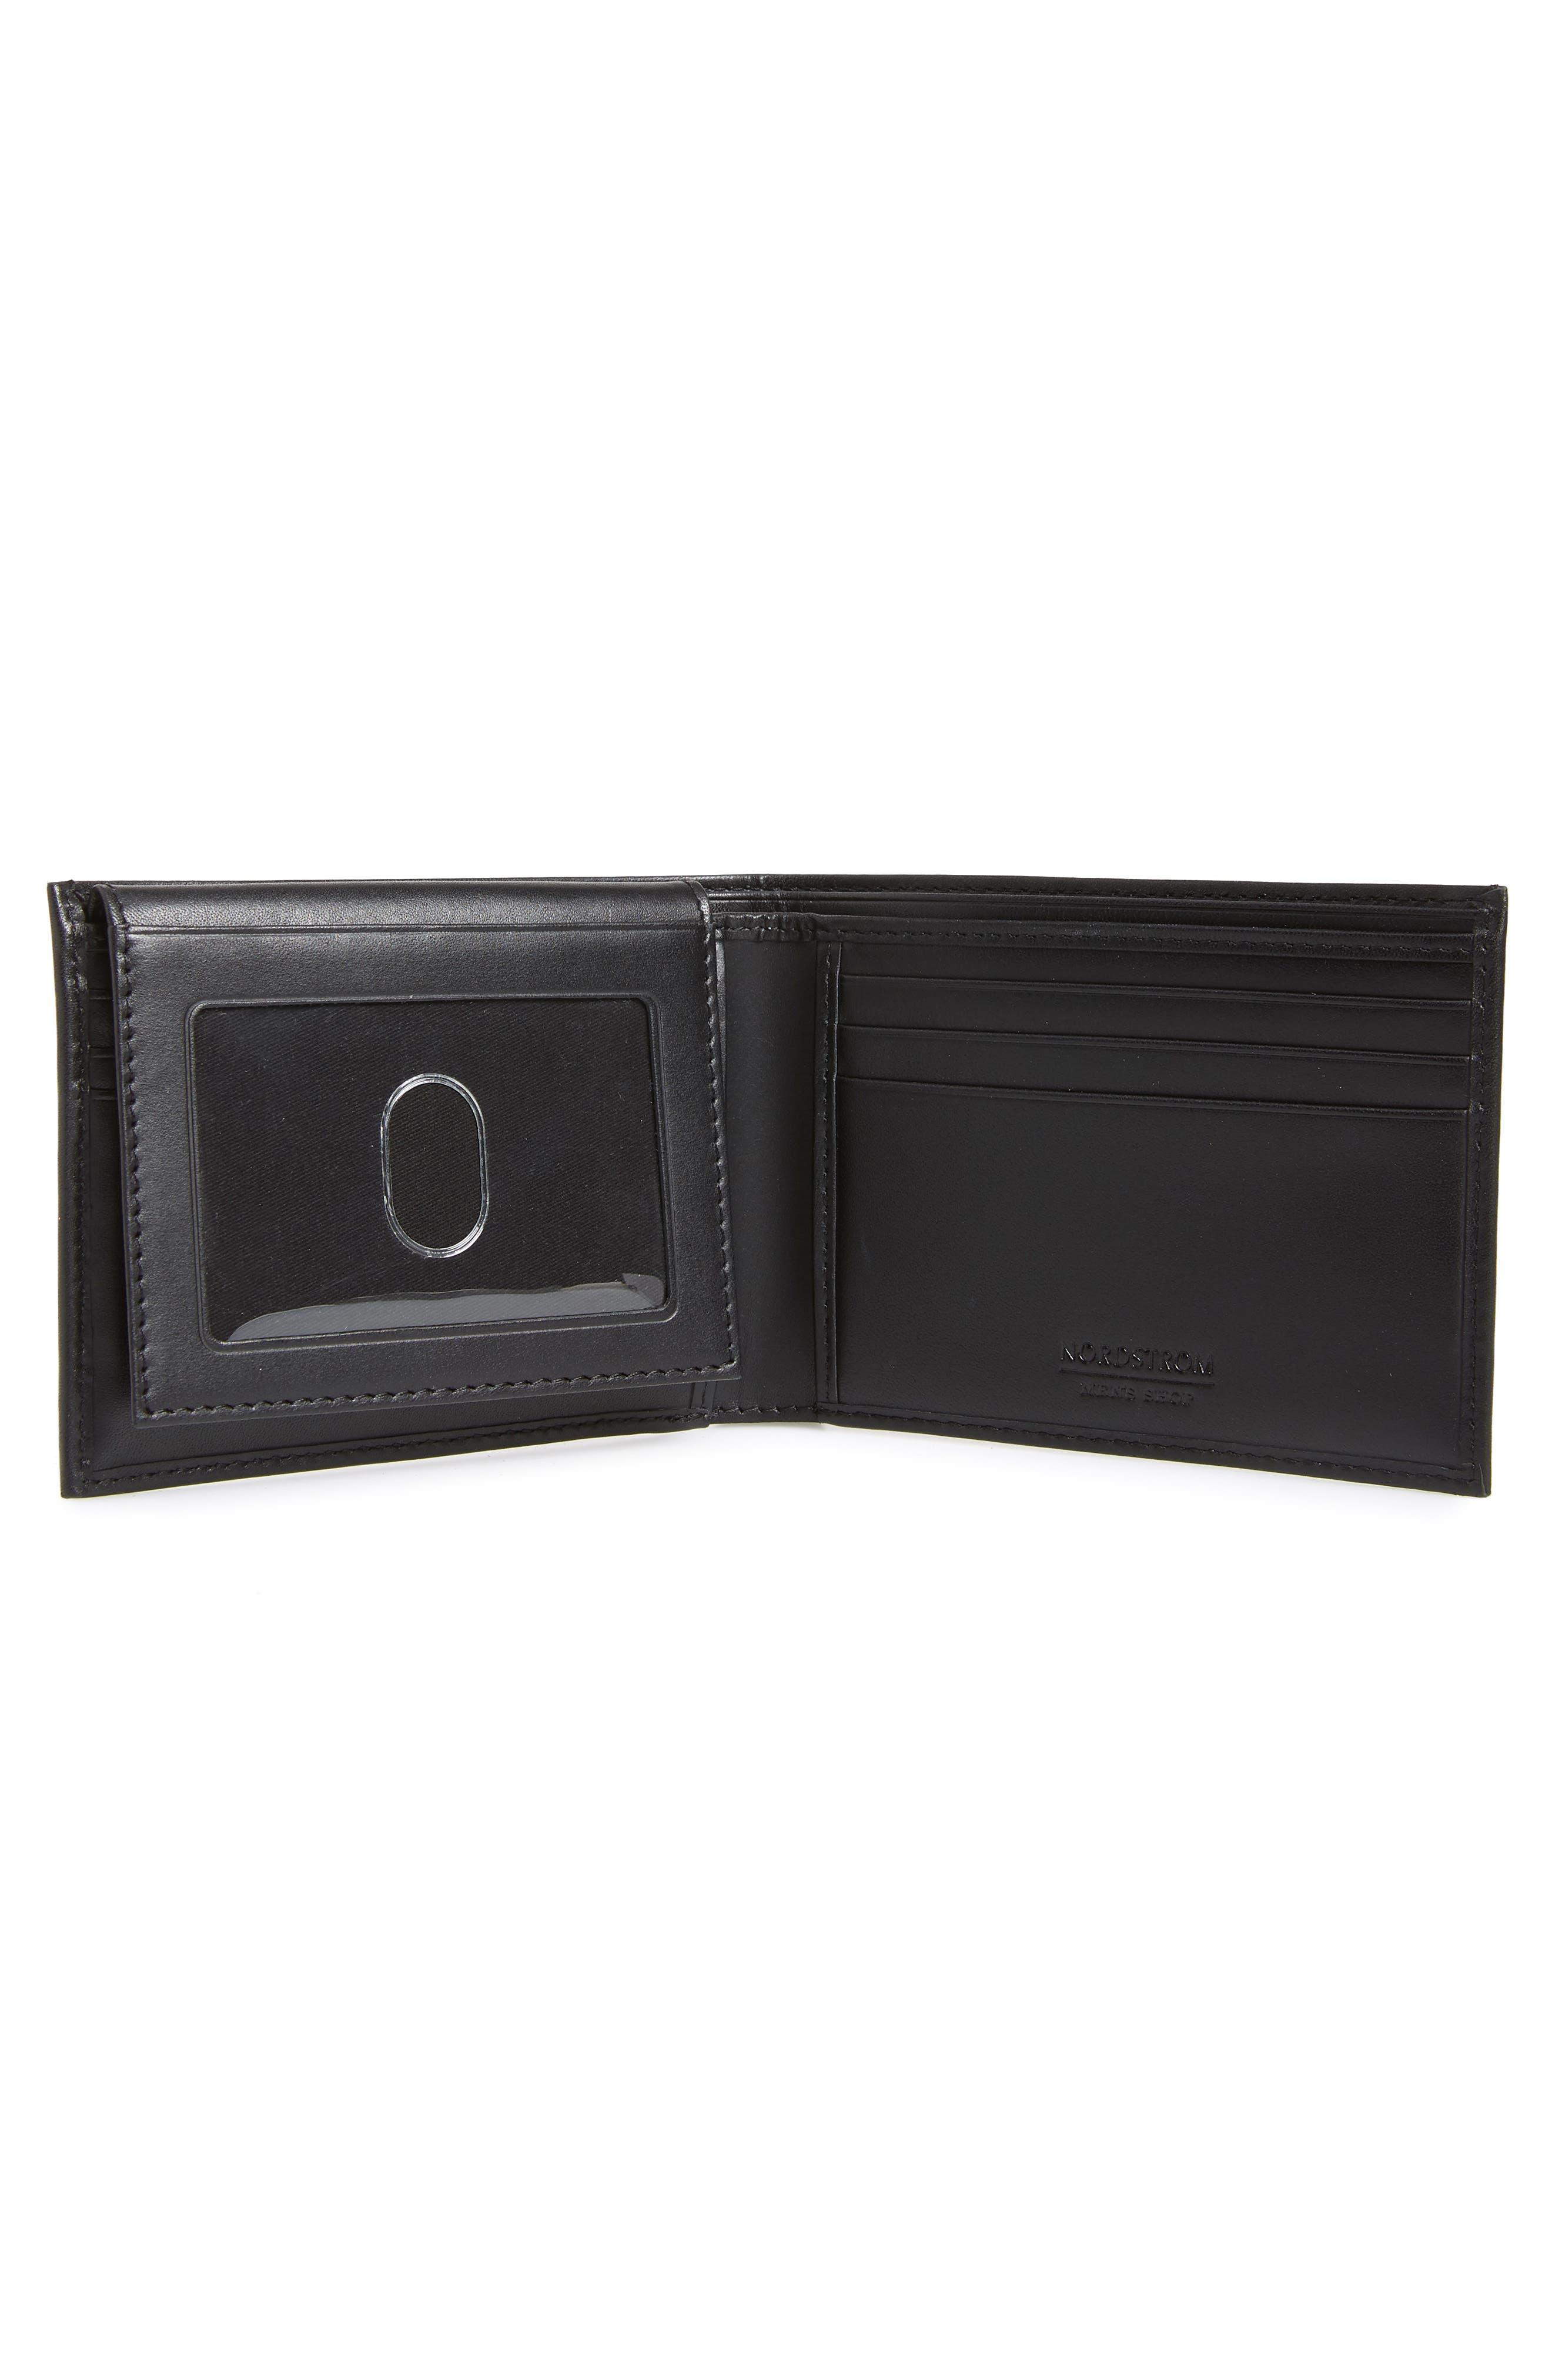 053fa5ac752a All Men's Wallets: Sale | Nordstrom